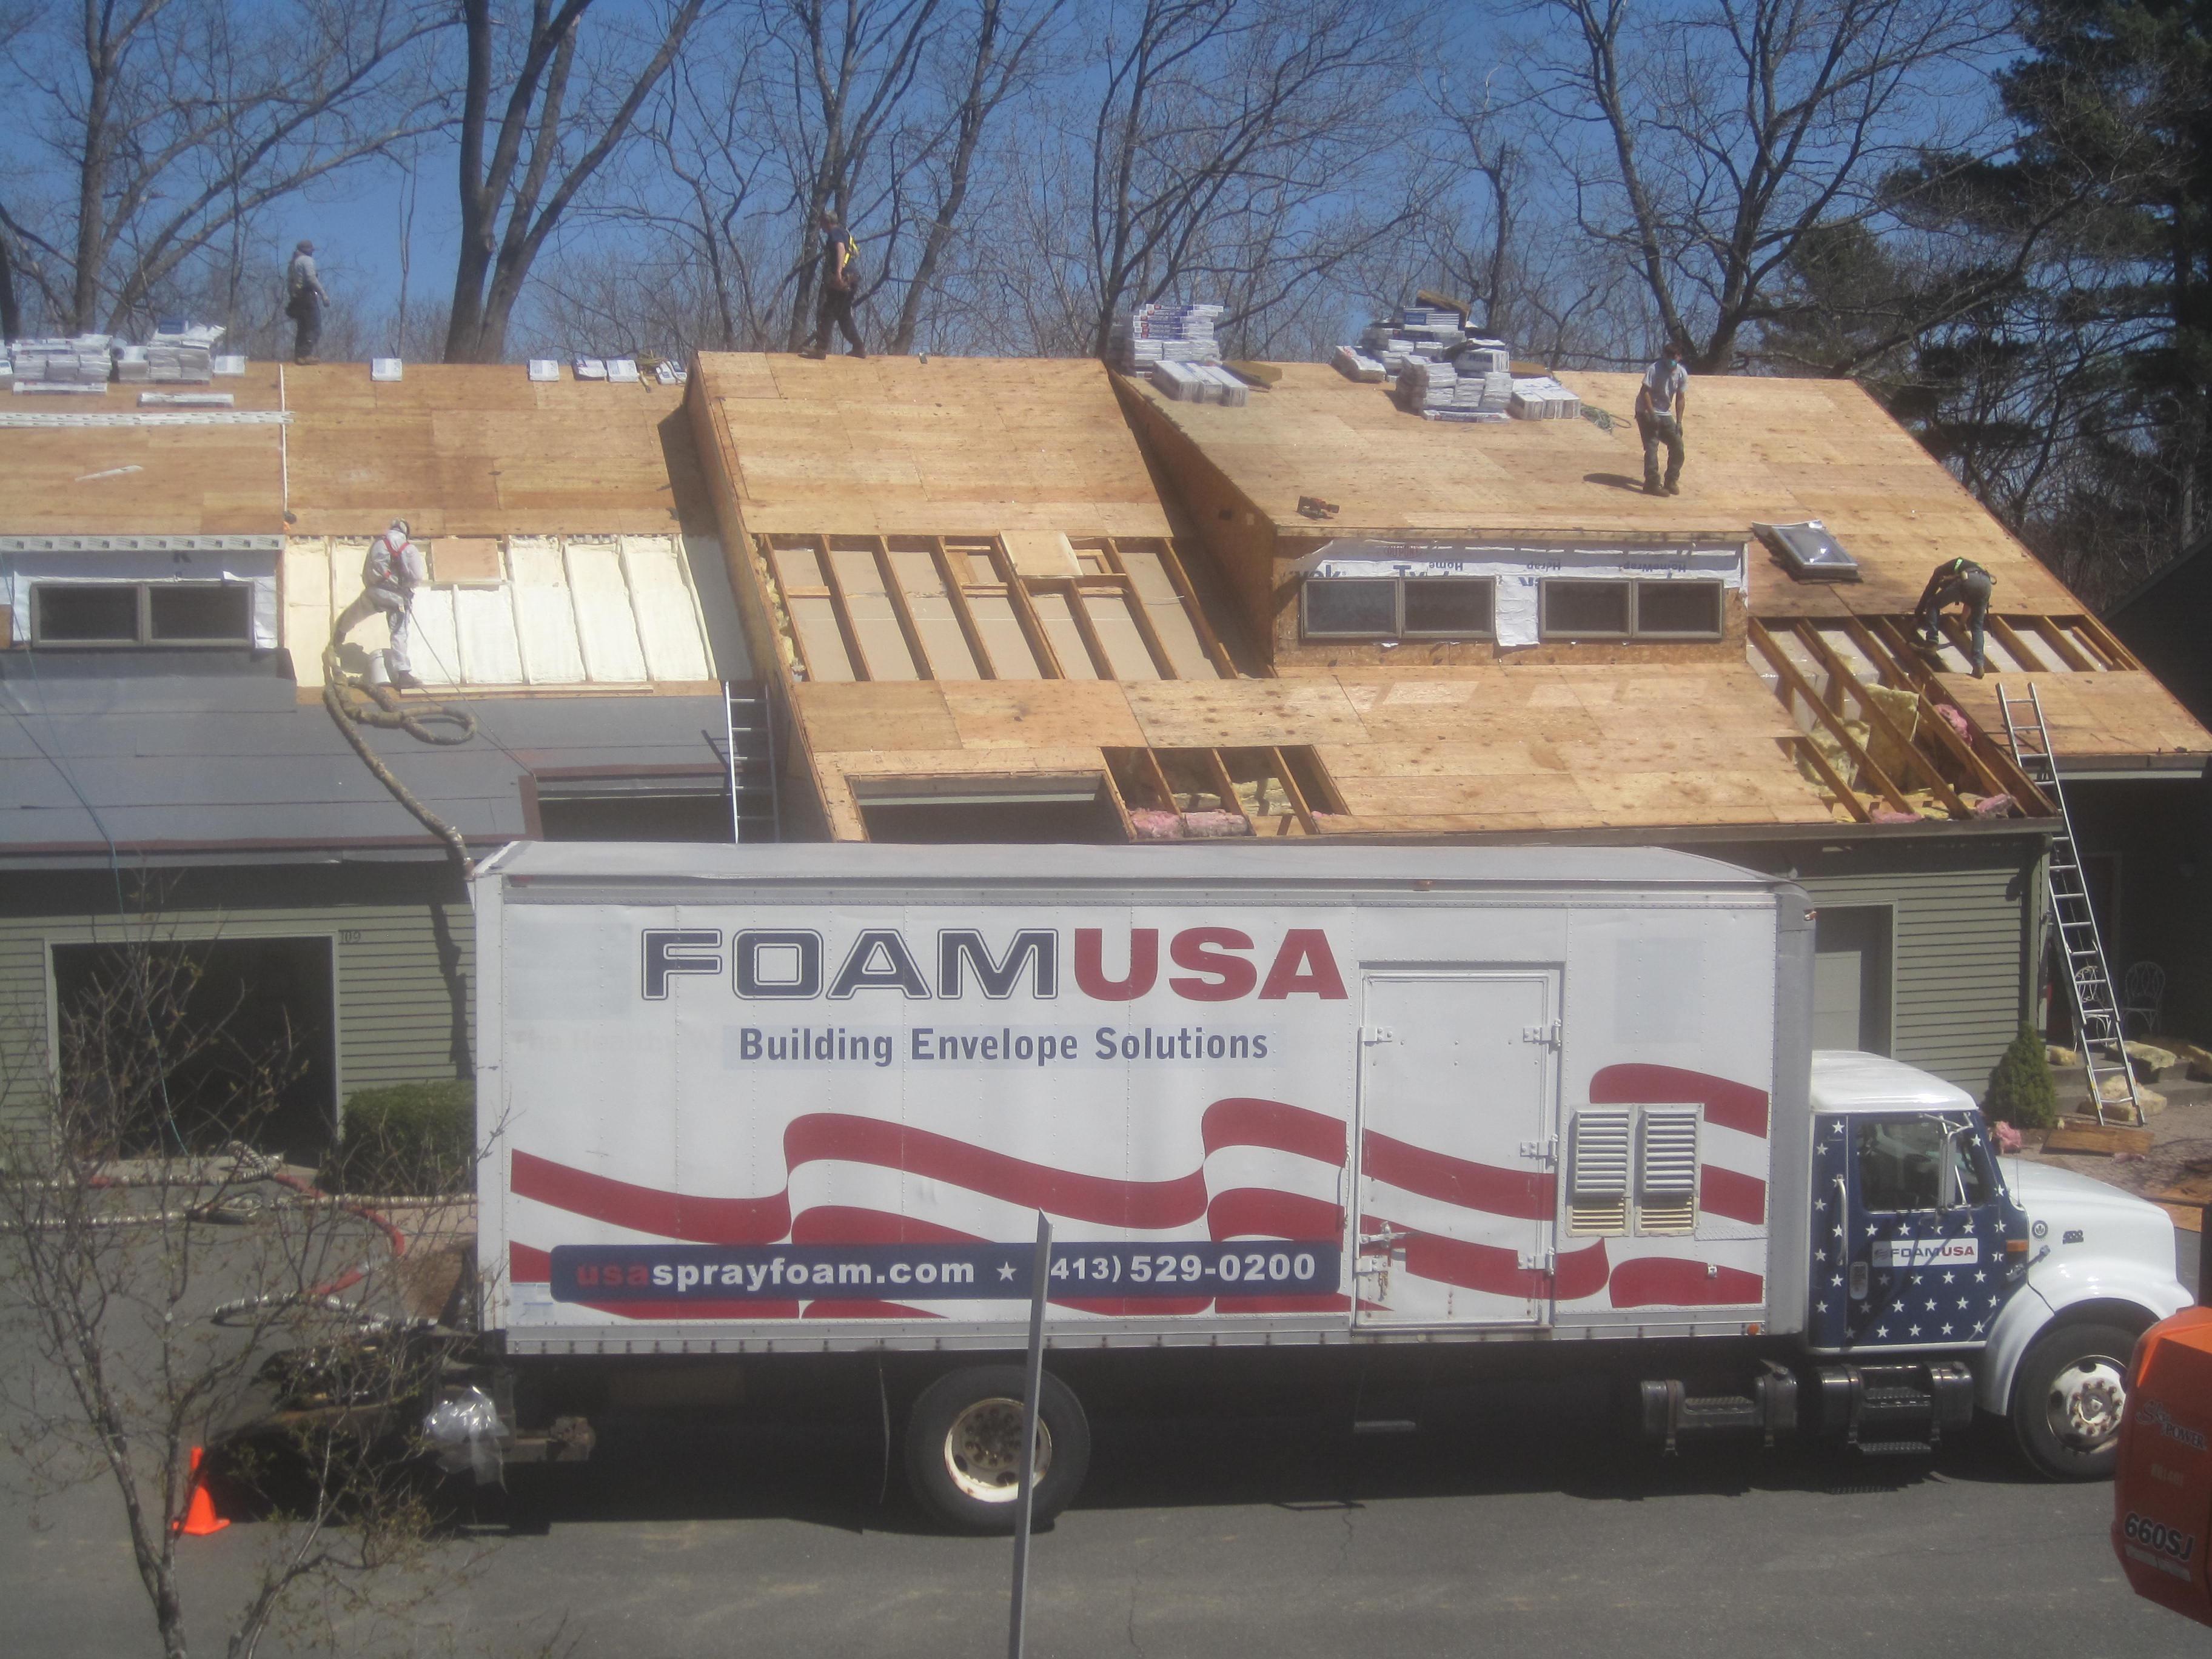 Residential spray foam insulation